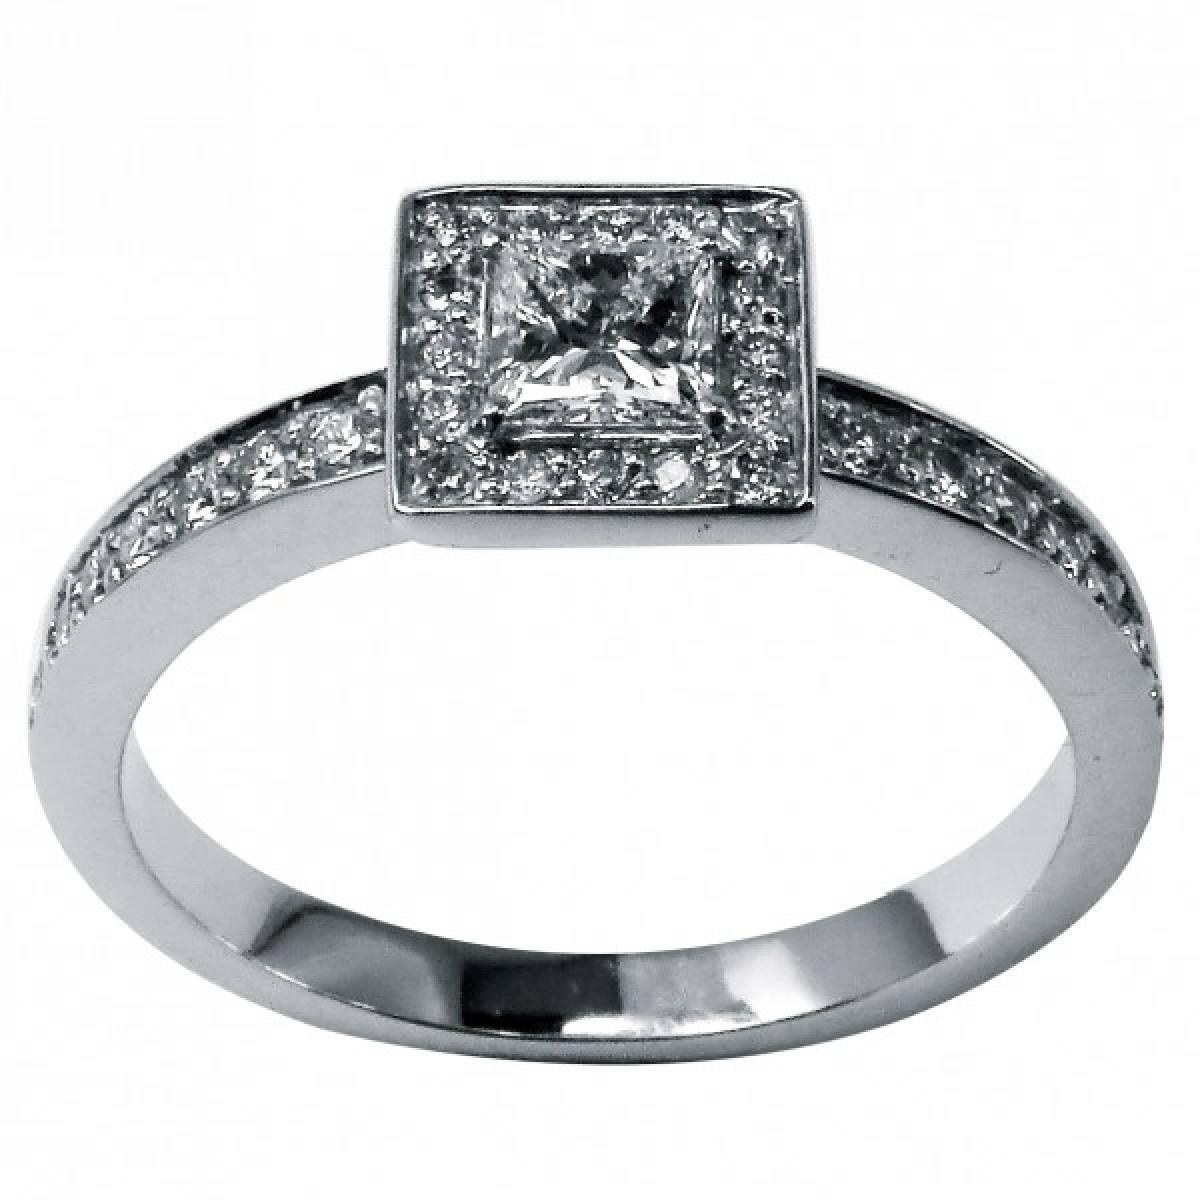 "Anel de Noivado ""PESARUM"" c/ diamantes ou zircónias, ouro de 19,2 kts"